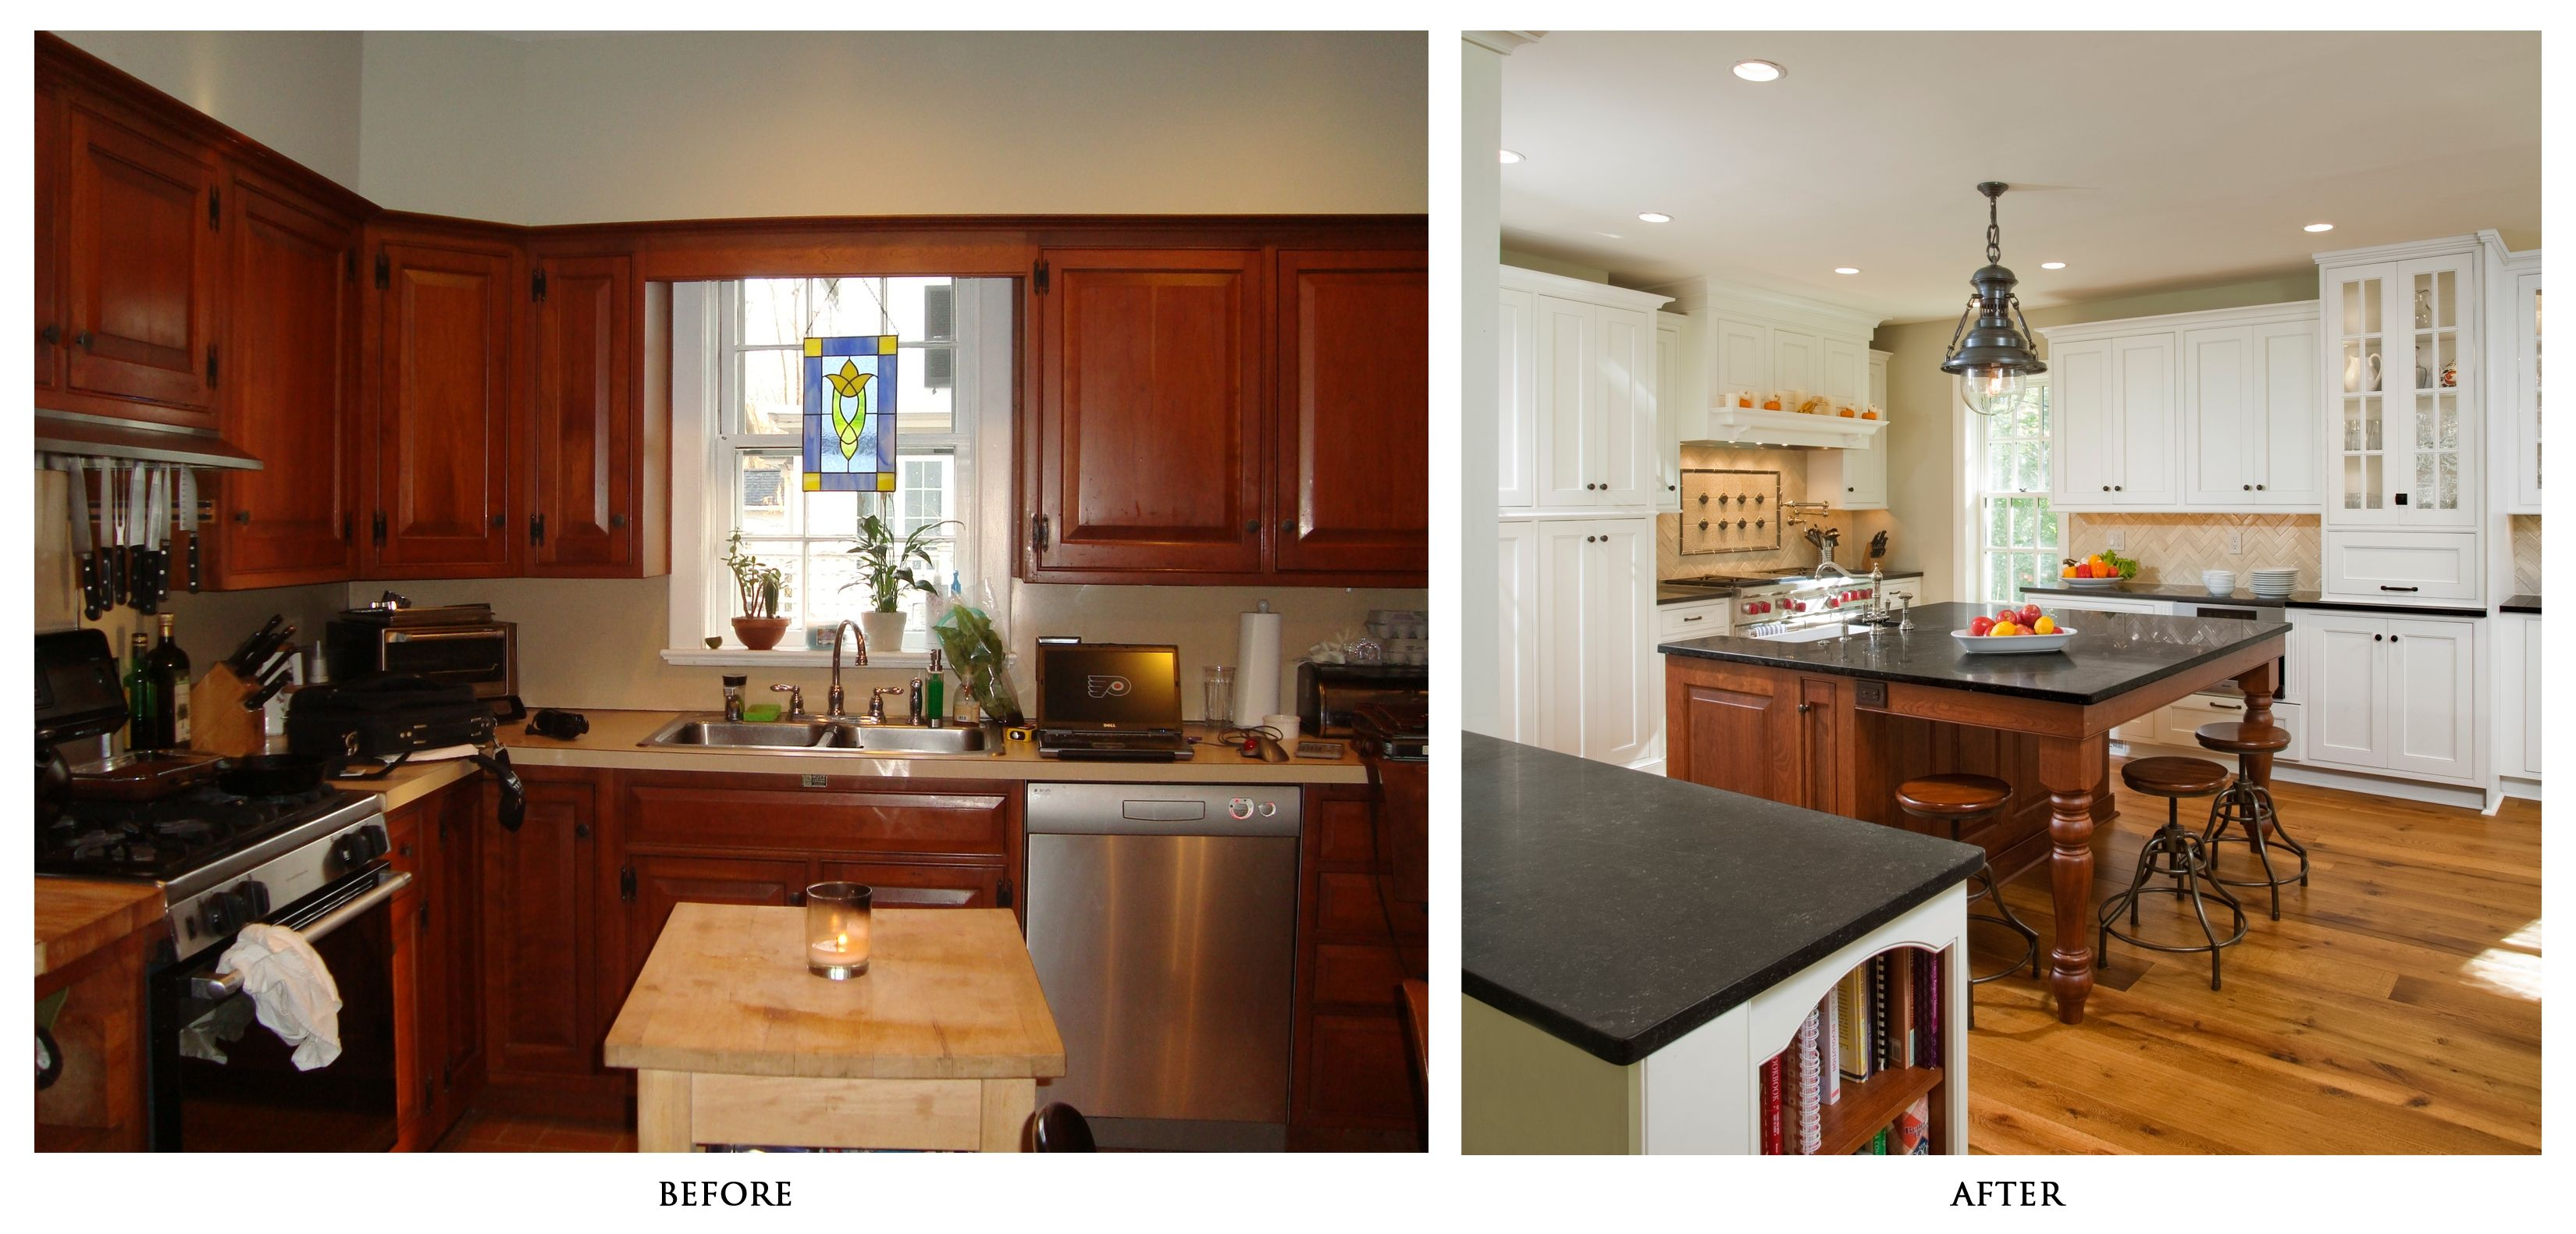 Beau More Ideas Below: #KitchenRemodel #Kitchen #Remodel Kitchen Remodel On A  Budget Small